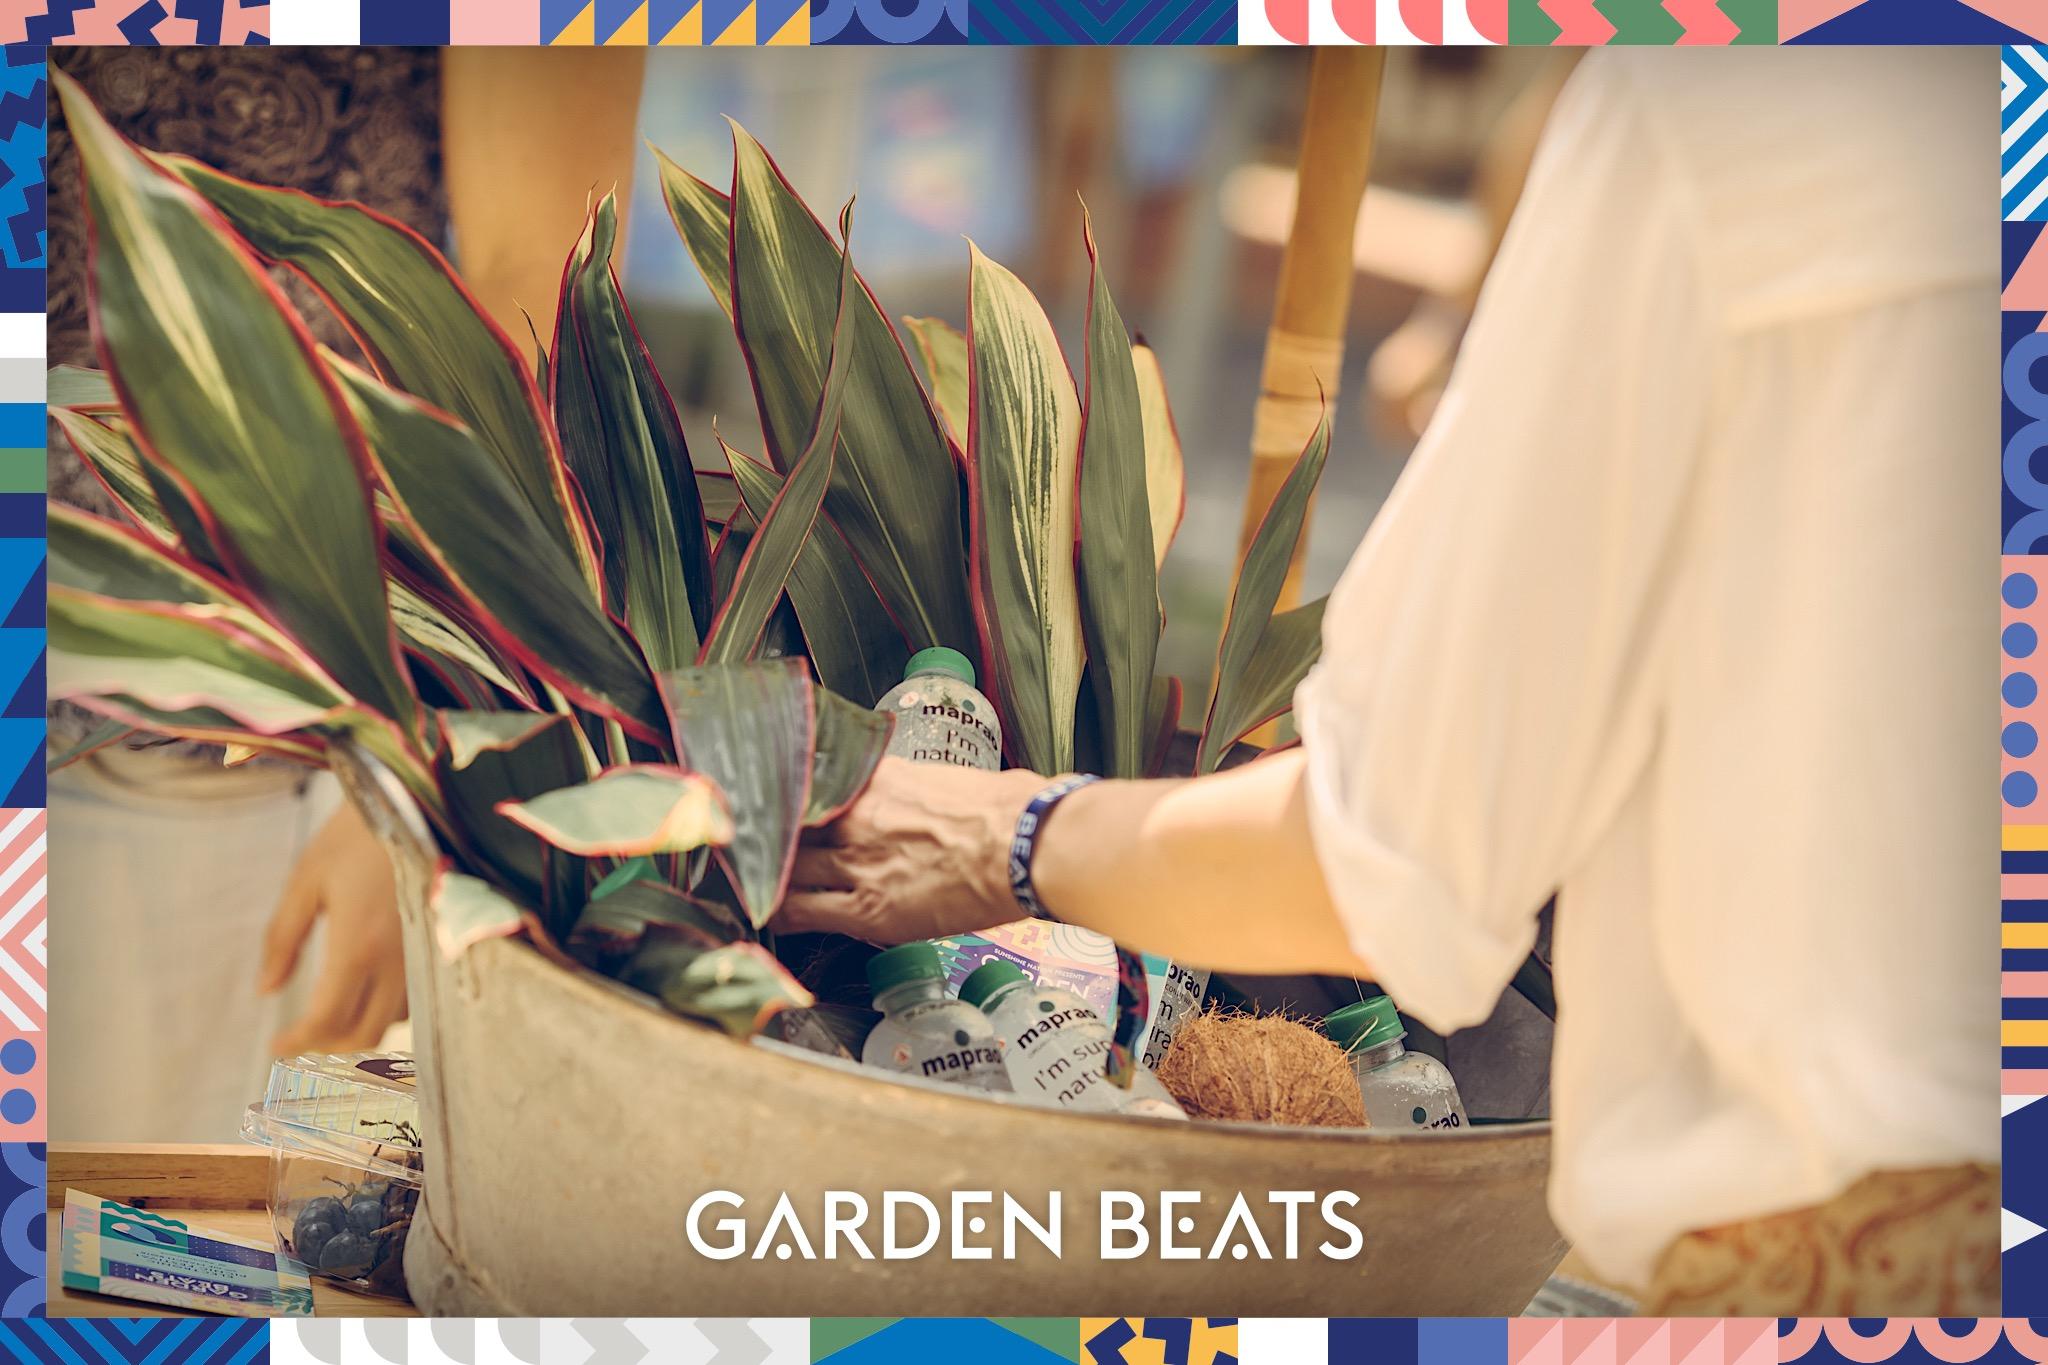 03032018_GardenBeats_Colossal071_Watermarked.jpg